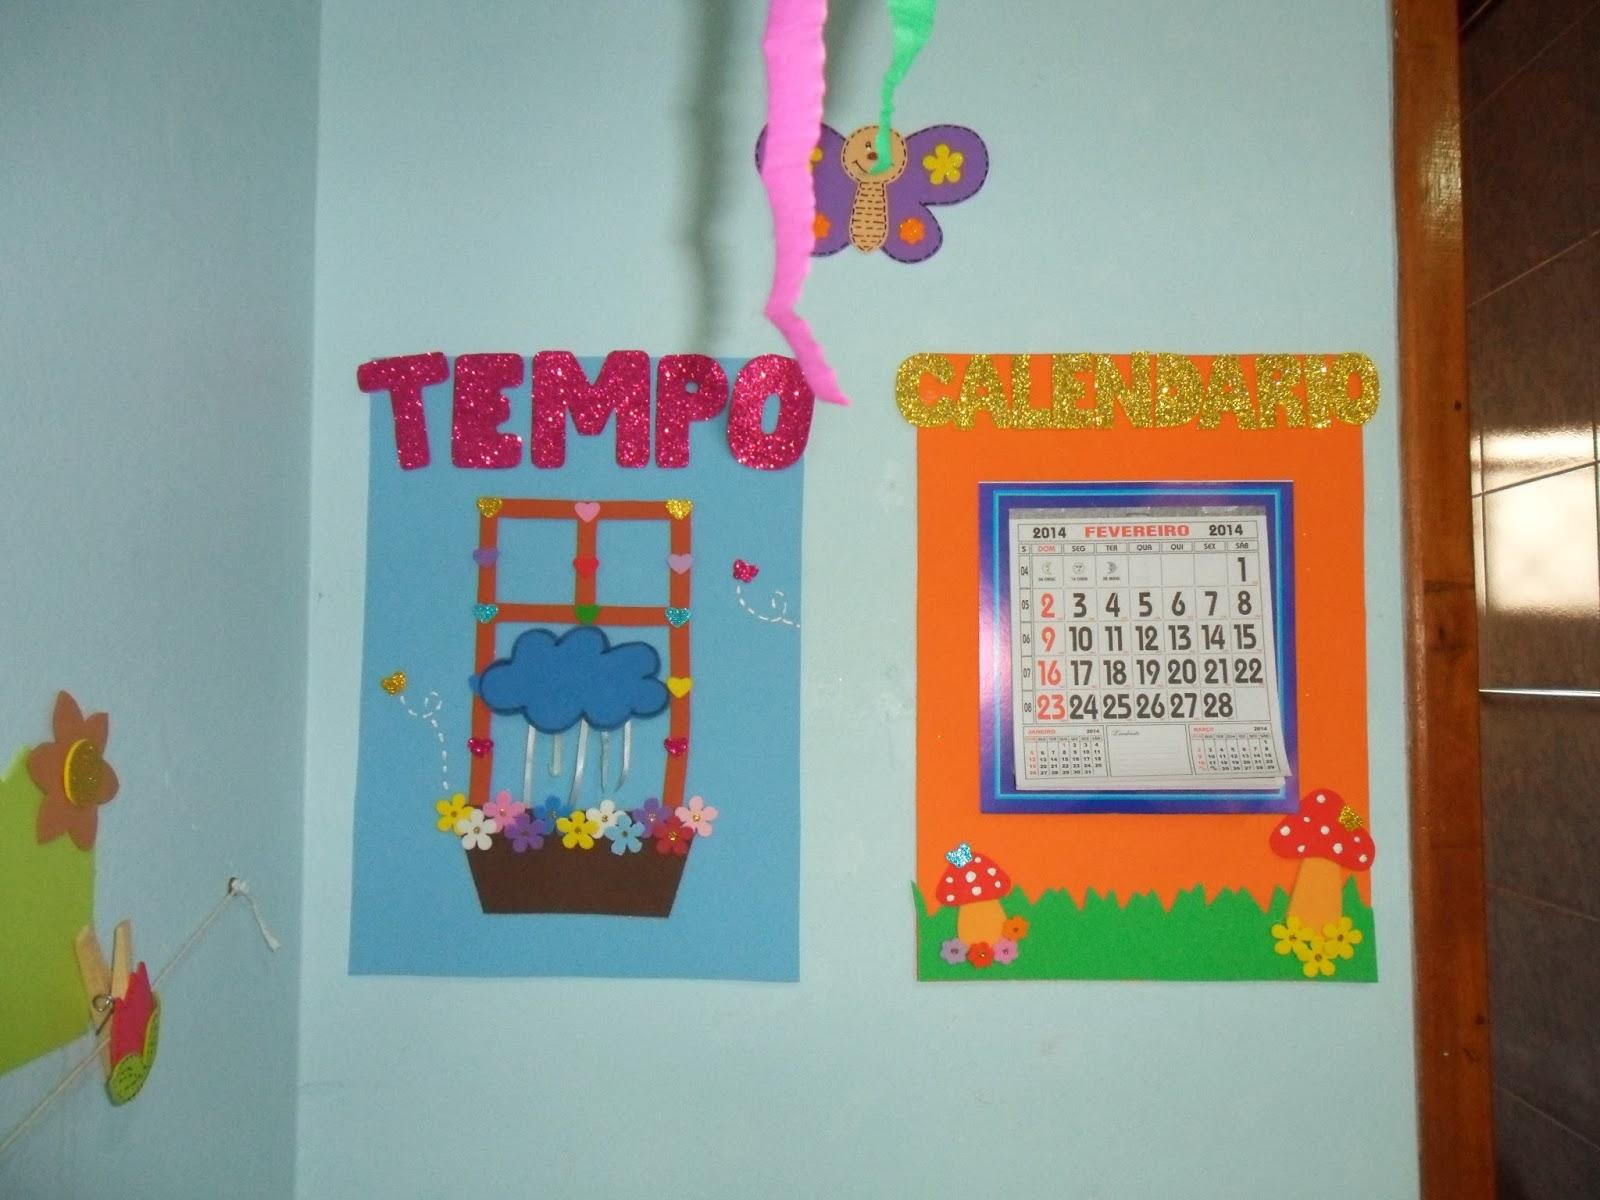 Decoracao De Sala Da Aula ~ decoracao de sala maternalPainel de Ideias Decoração de sala